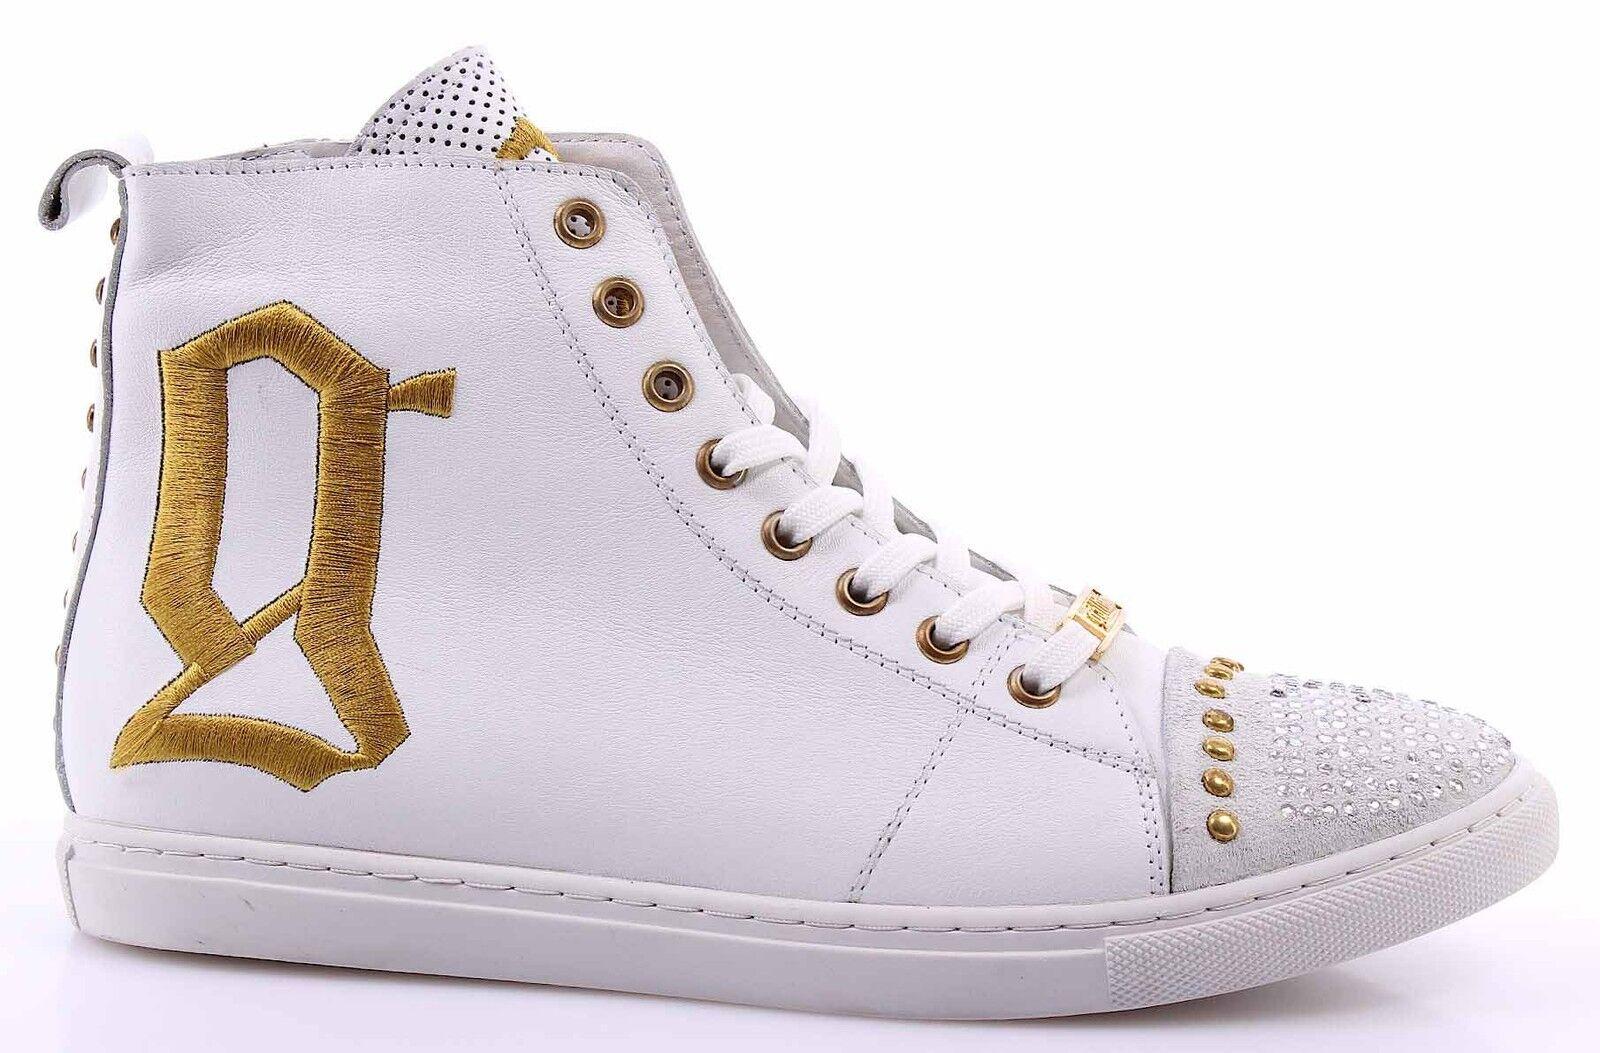 Scarpe Sneakers Alte Donna GALLIANO 2974 Var Var Var B-A Pelle Bianca bb0bda